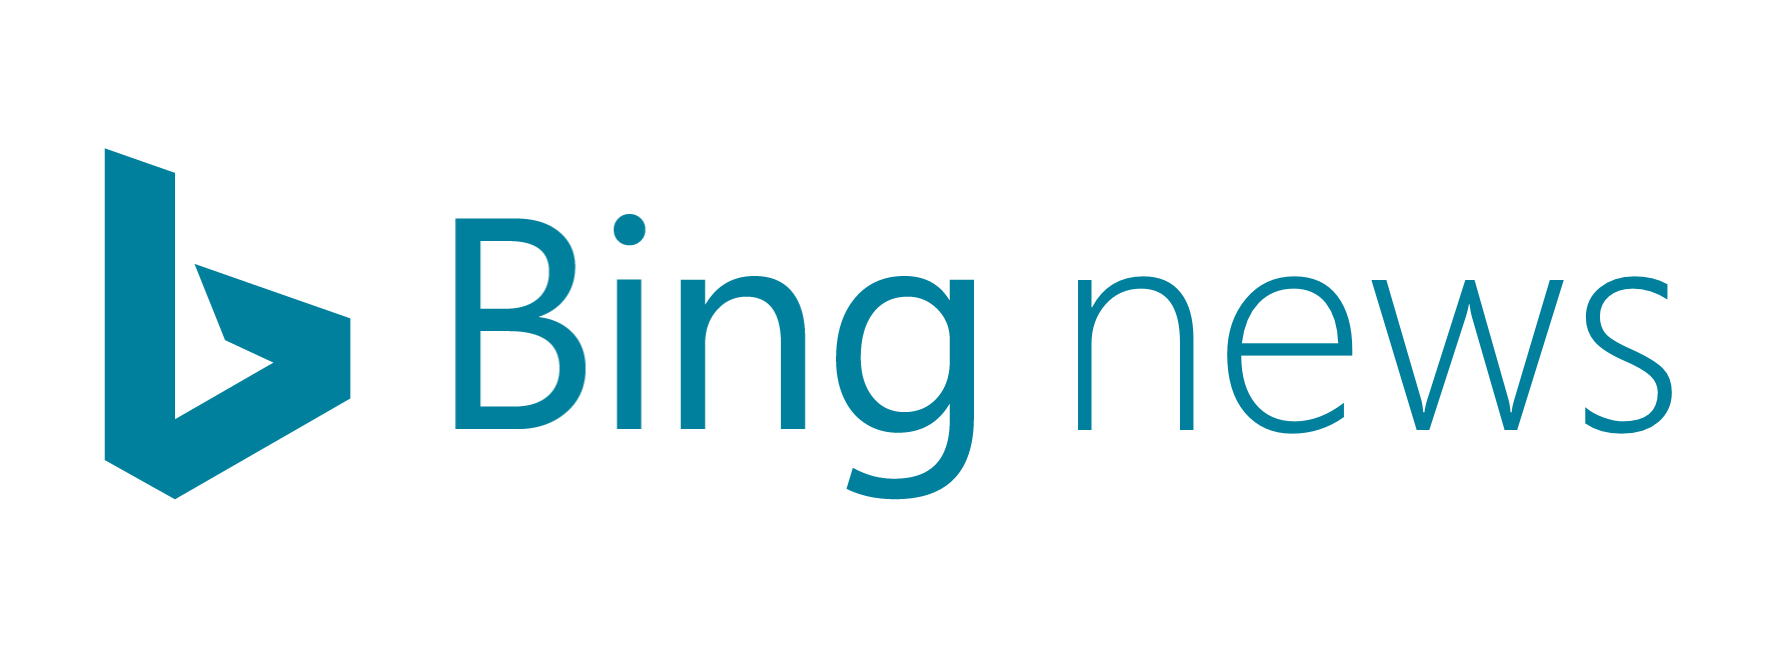 Bing News logo